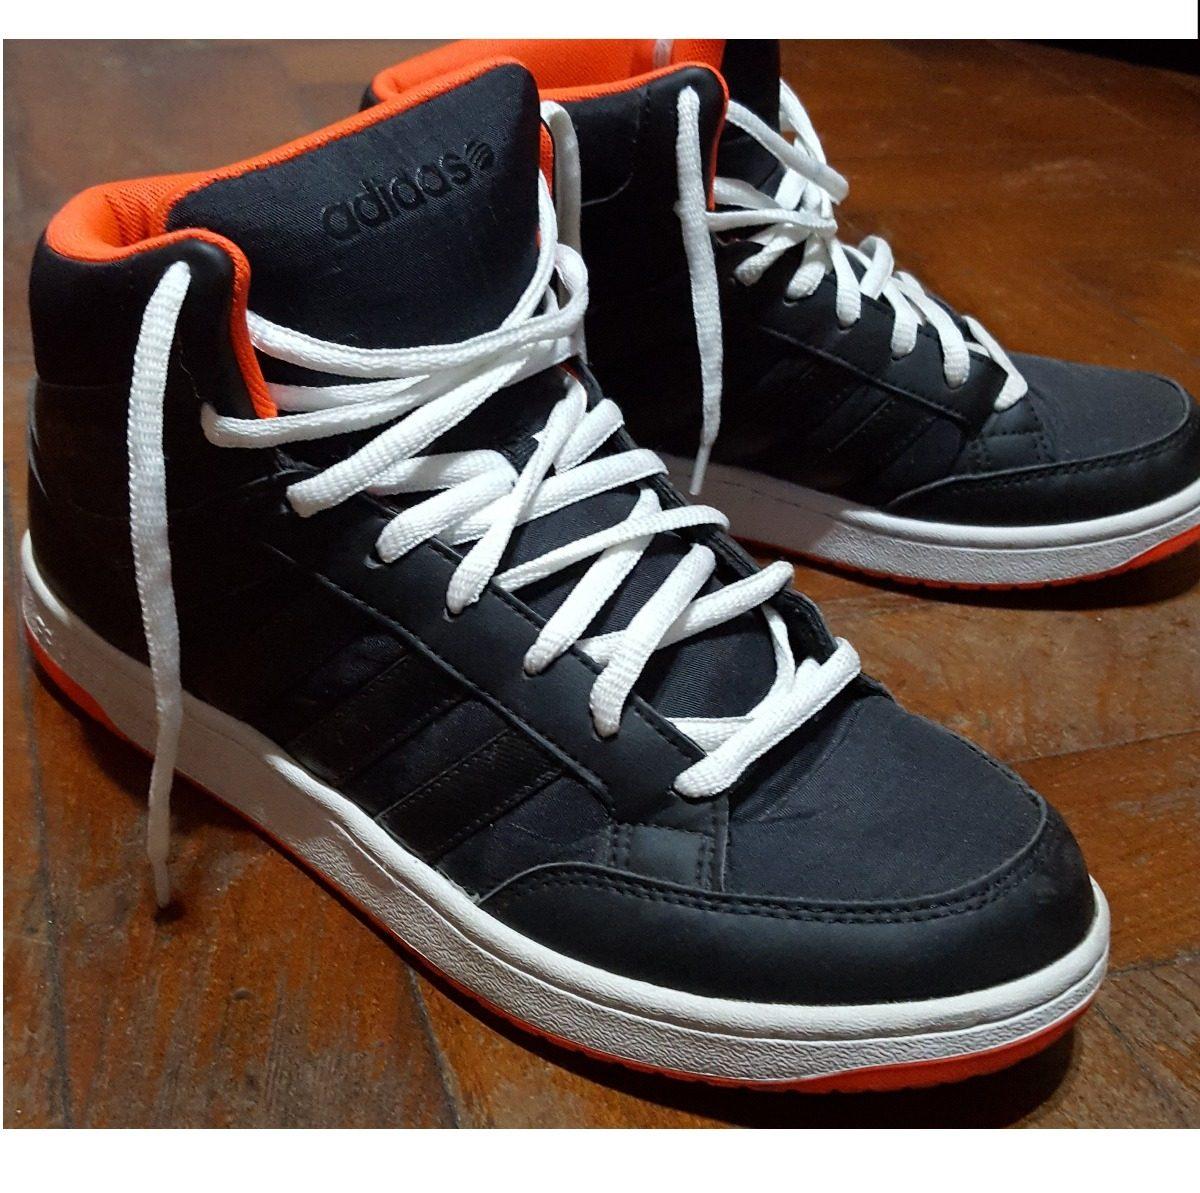 zapatillas adidas naranjas fluor